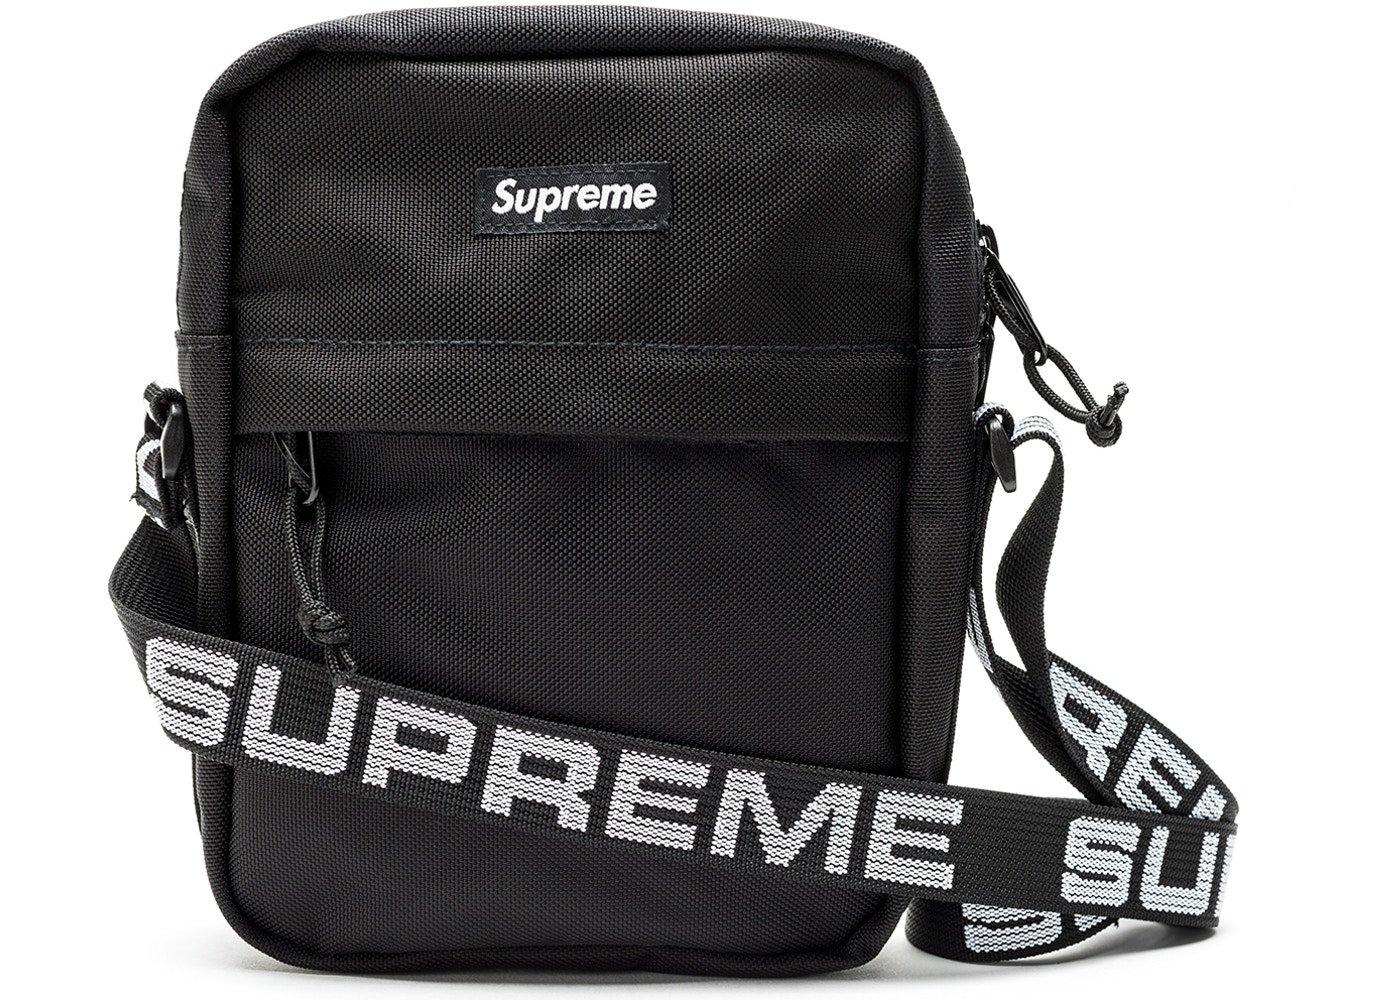 scarpe di separazione 2c432 d43e5 WTB Shoulder Bag Supreme ss18 - Meetapp